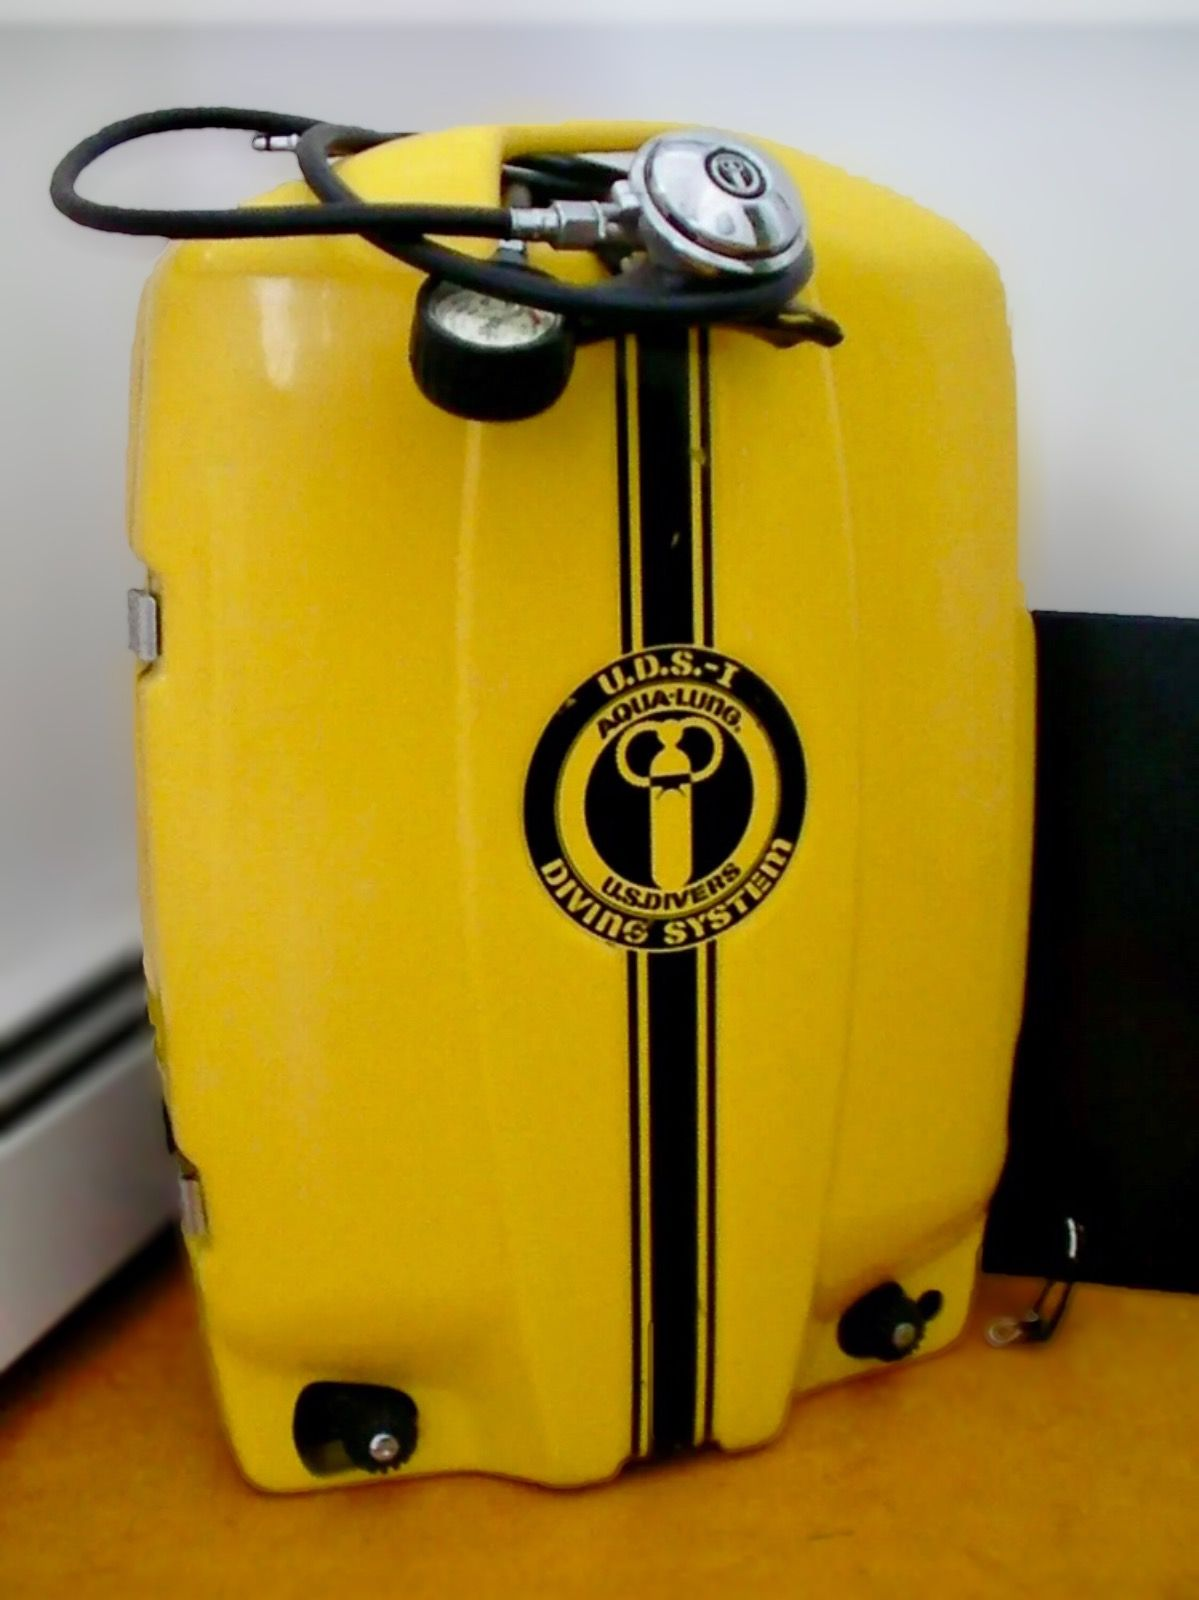 Pin by Aqua Ventures LTD. on Old equipment Underwater